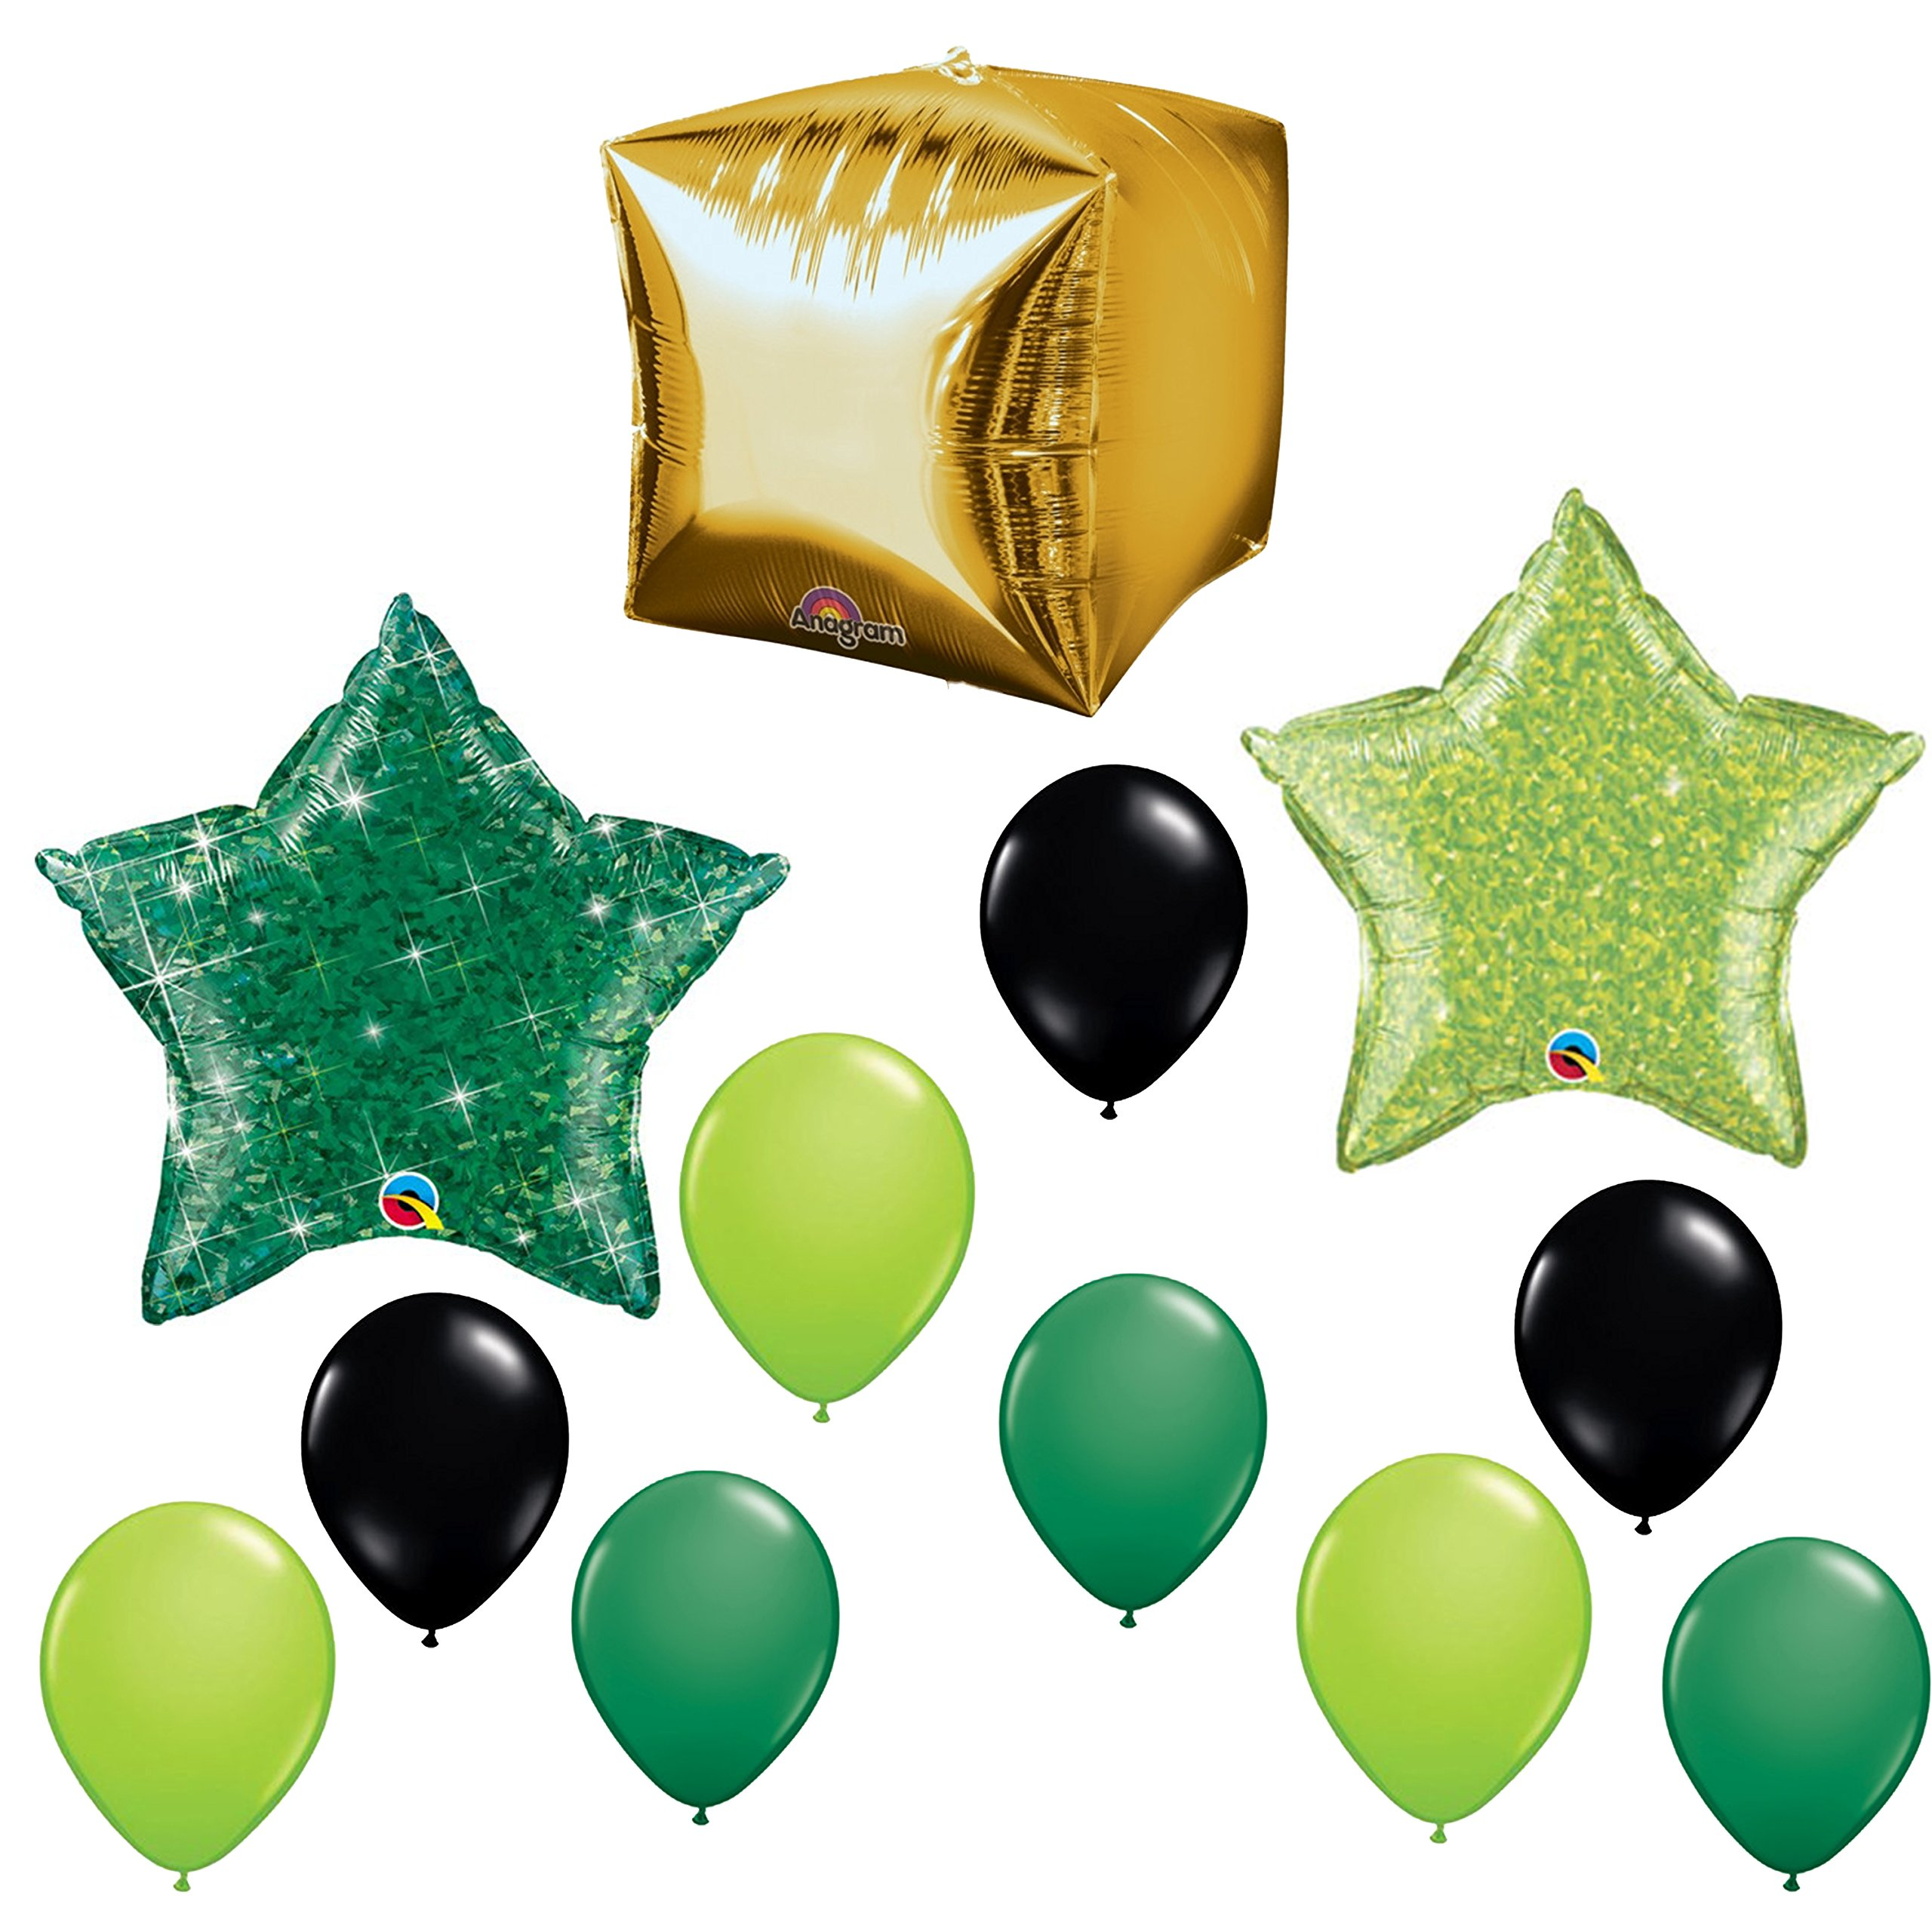 Mining Pixel 4th Birthday Party Balloon Decoration Kit